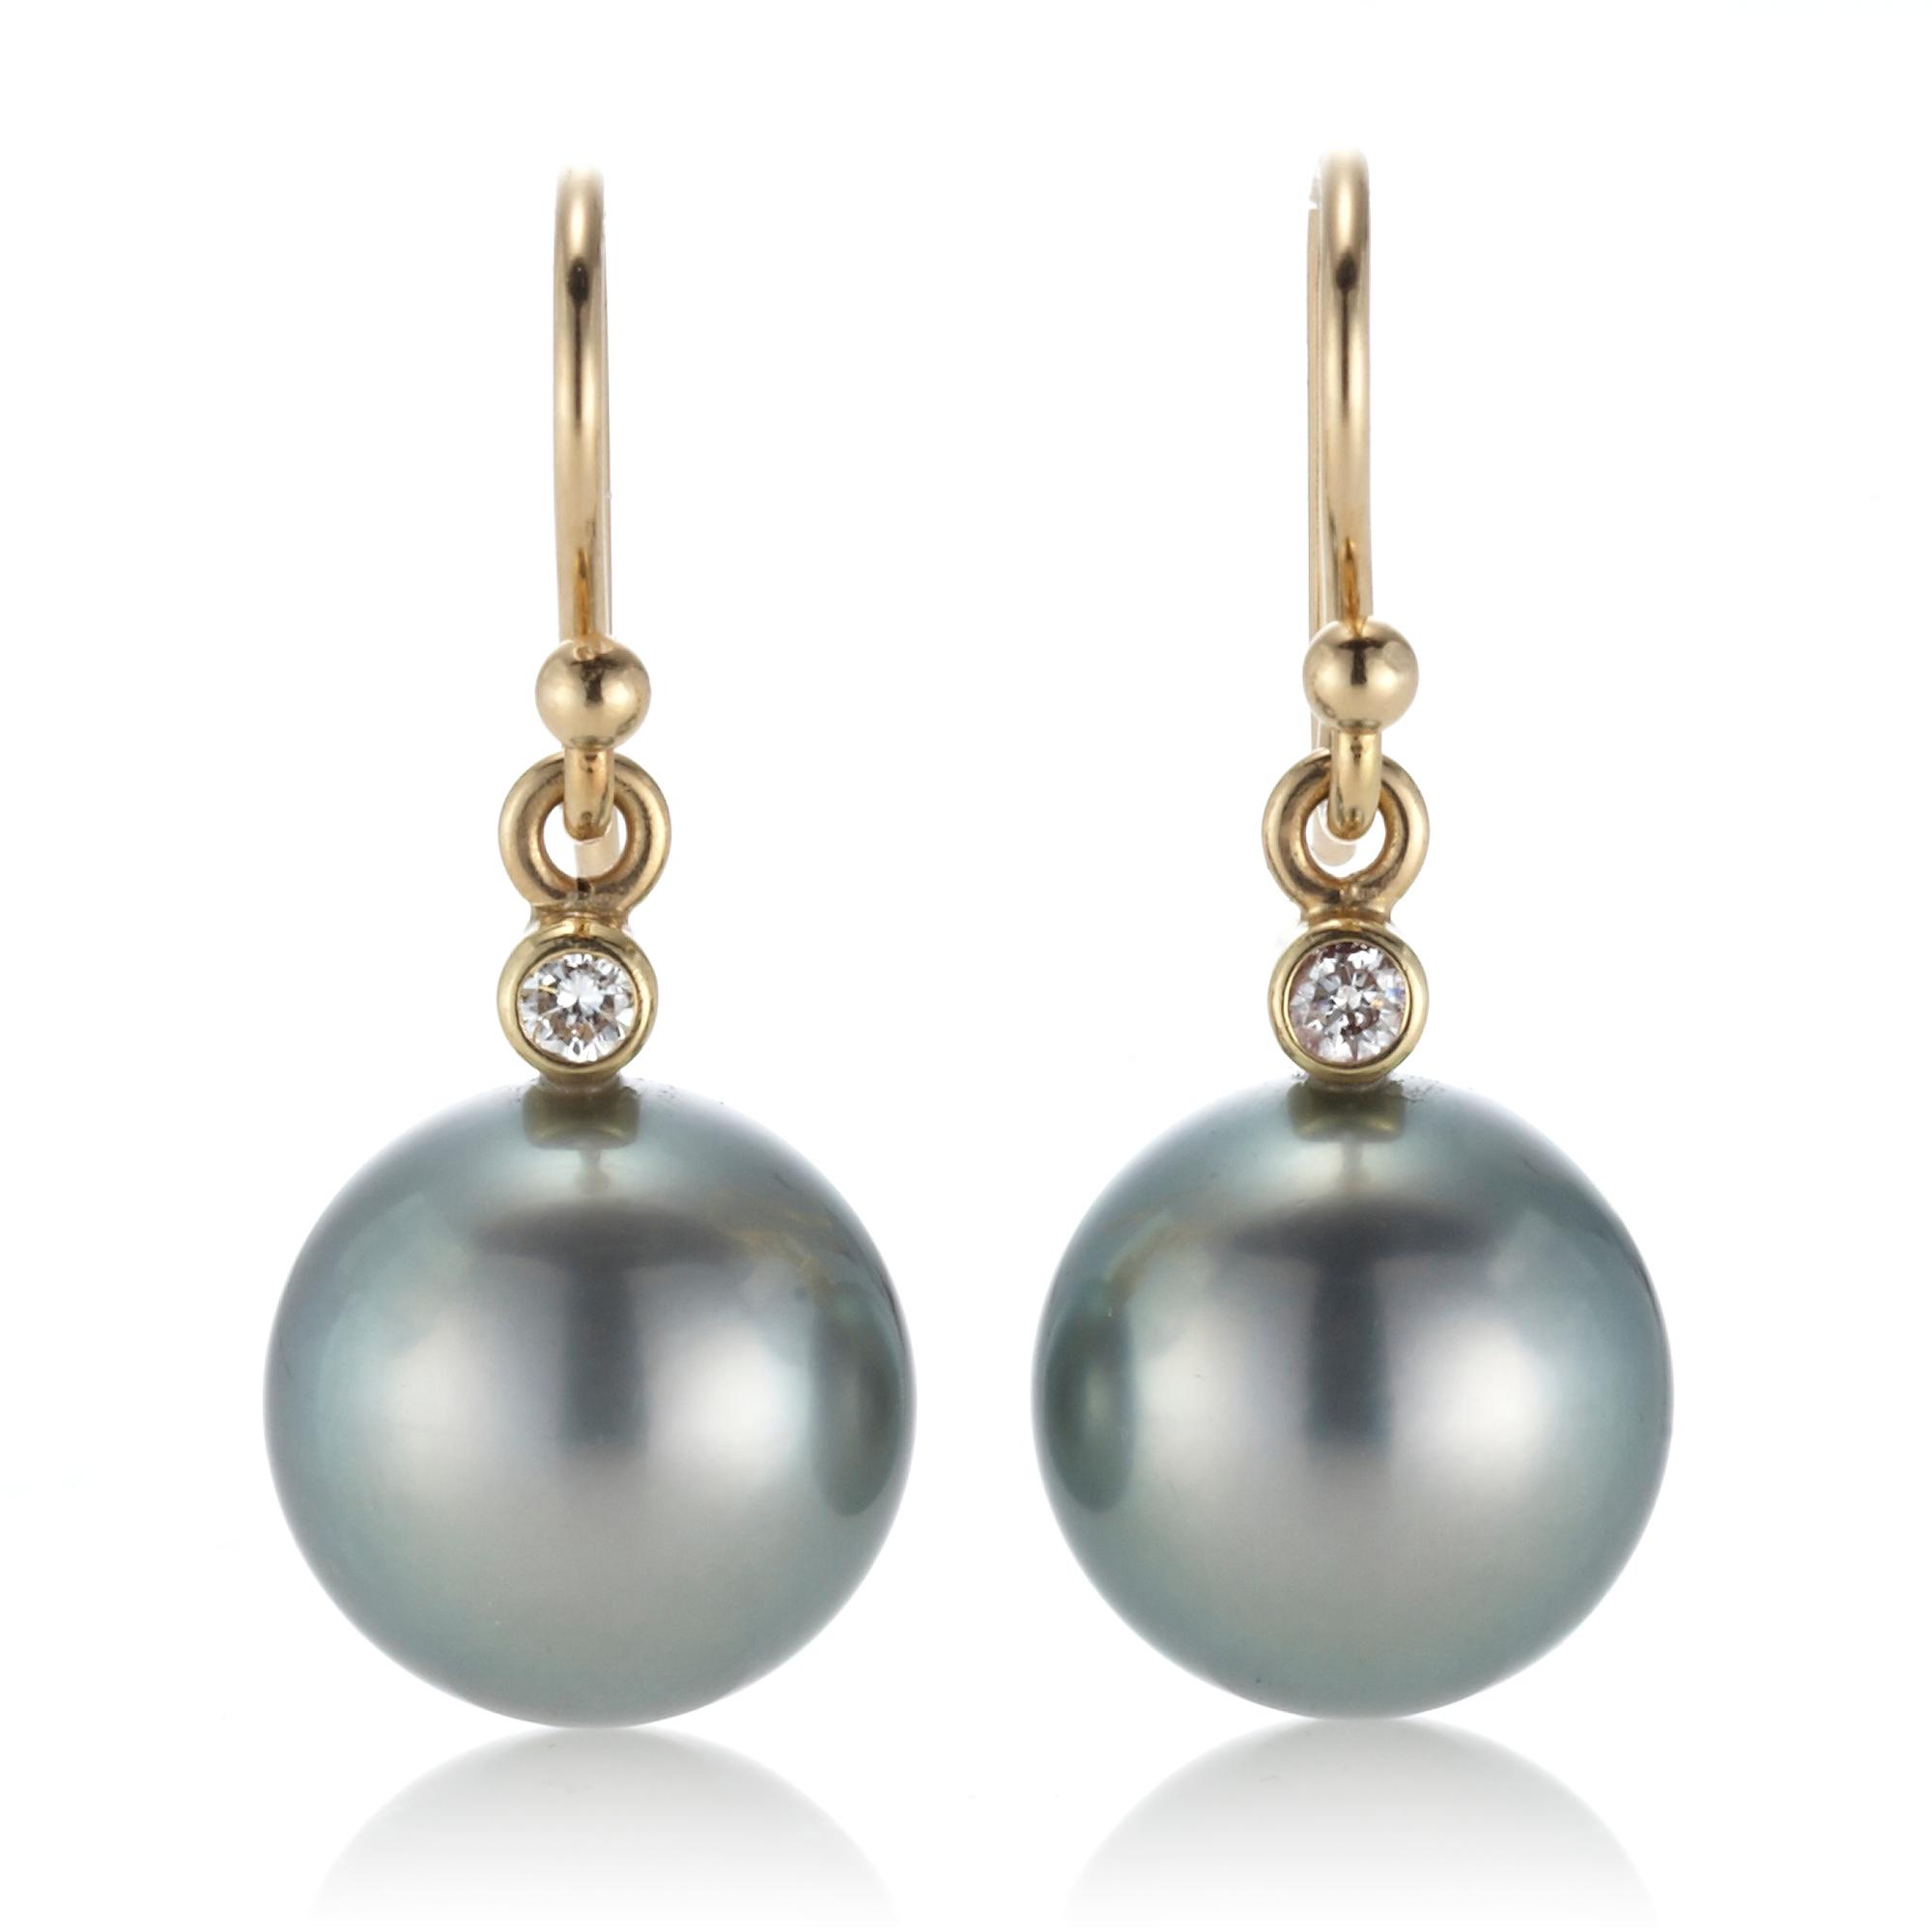 Bluegray Tahitian Pearl & Diamond Drop Earrings  Gump's. Copper Wire Rings. Love Maegan Wedding Rings. Ct Sapphire Engagement Rings. 50p Coin Rings. 0.10 Carat Wedding Rings. Simple Style Wedding Rings. $24.99 Engagement Rings. Bold Wedding Rings